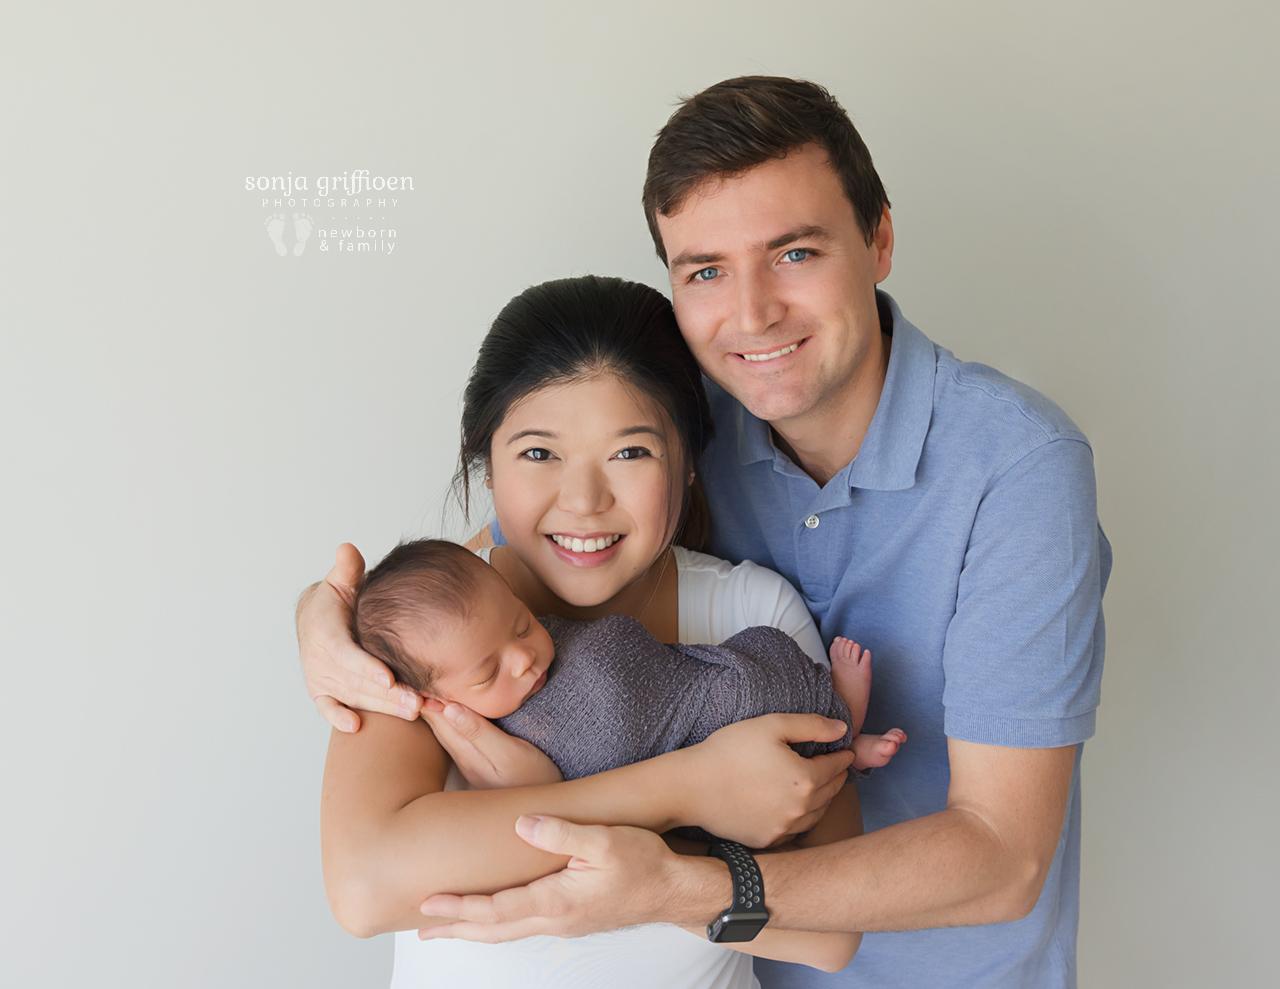 Ethan-Newborn-Brisbane-Newborn-Photographer-Sonja-Griffioen-04.jpg